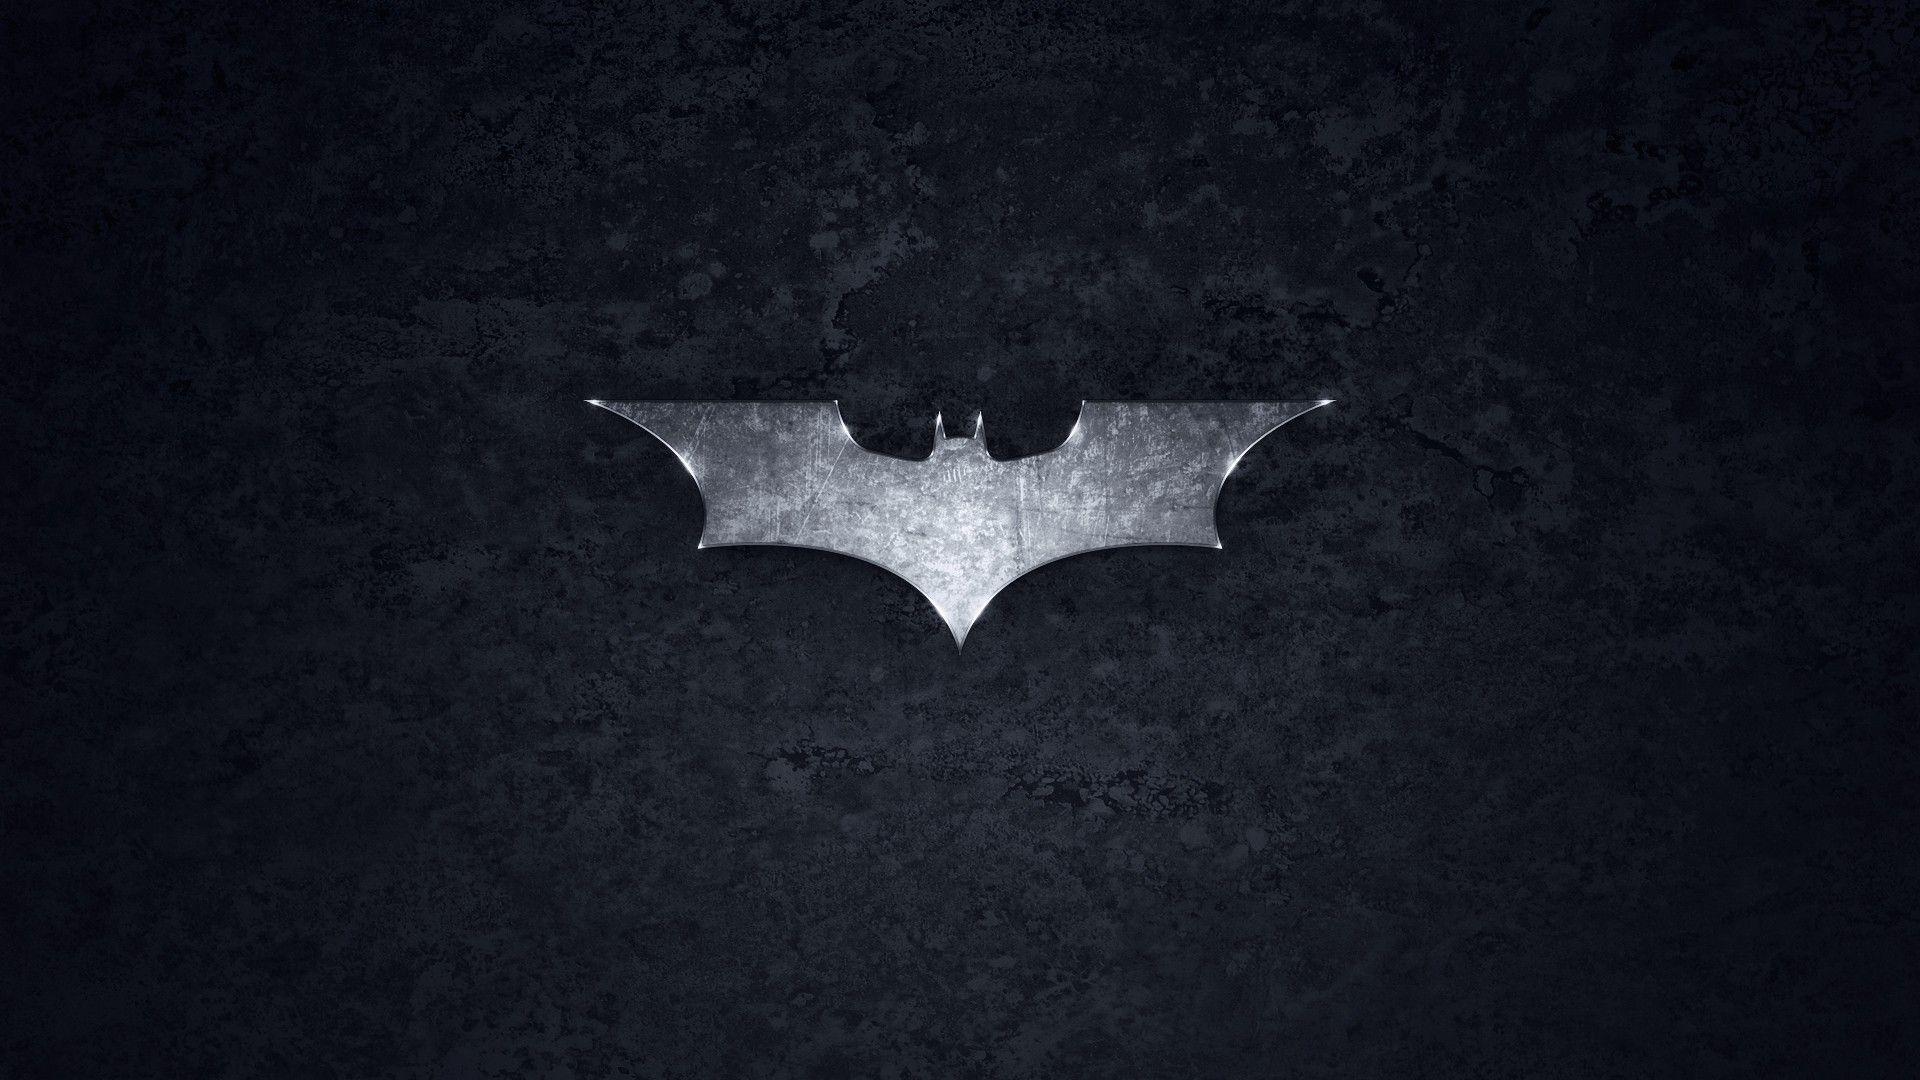 Batman Animated Wallpapers Top Free Batman Animated